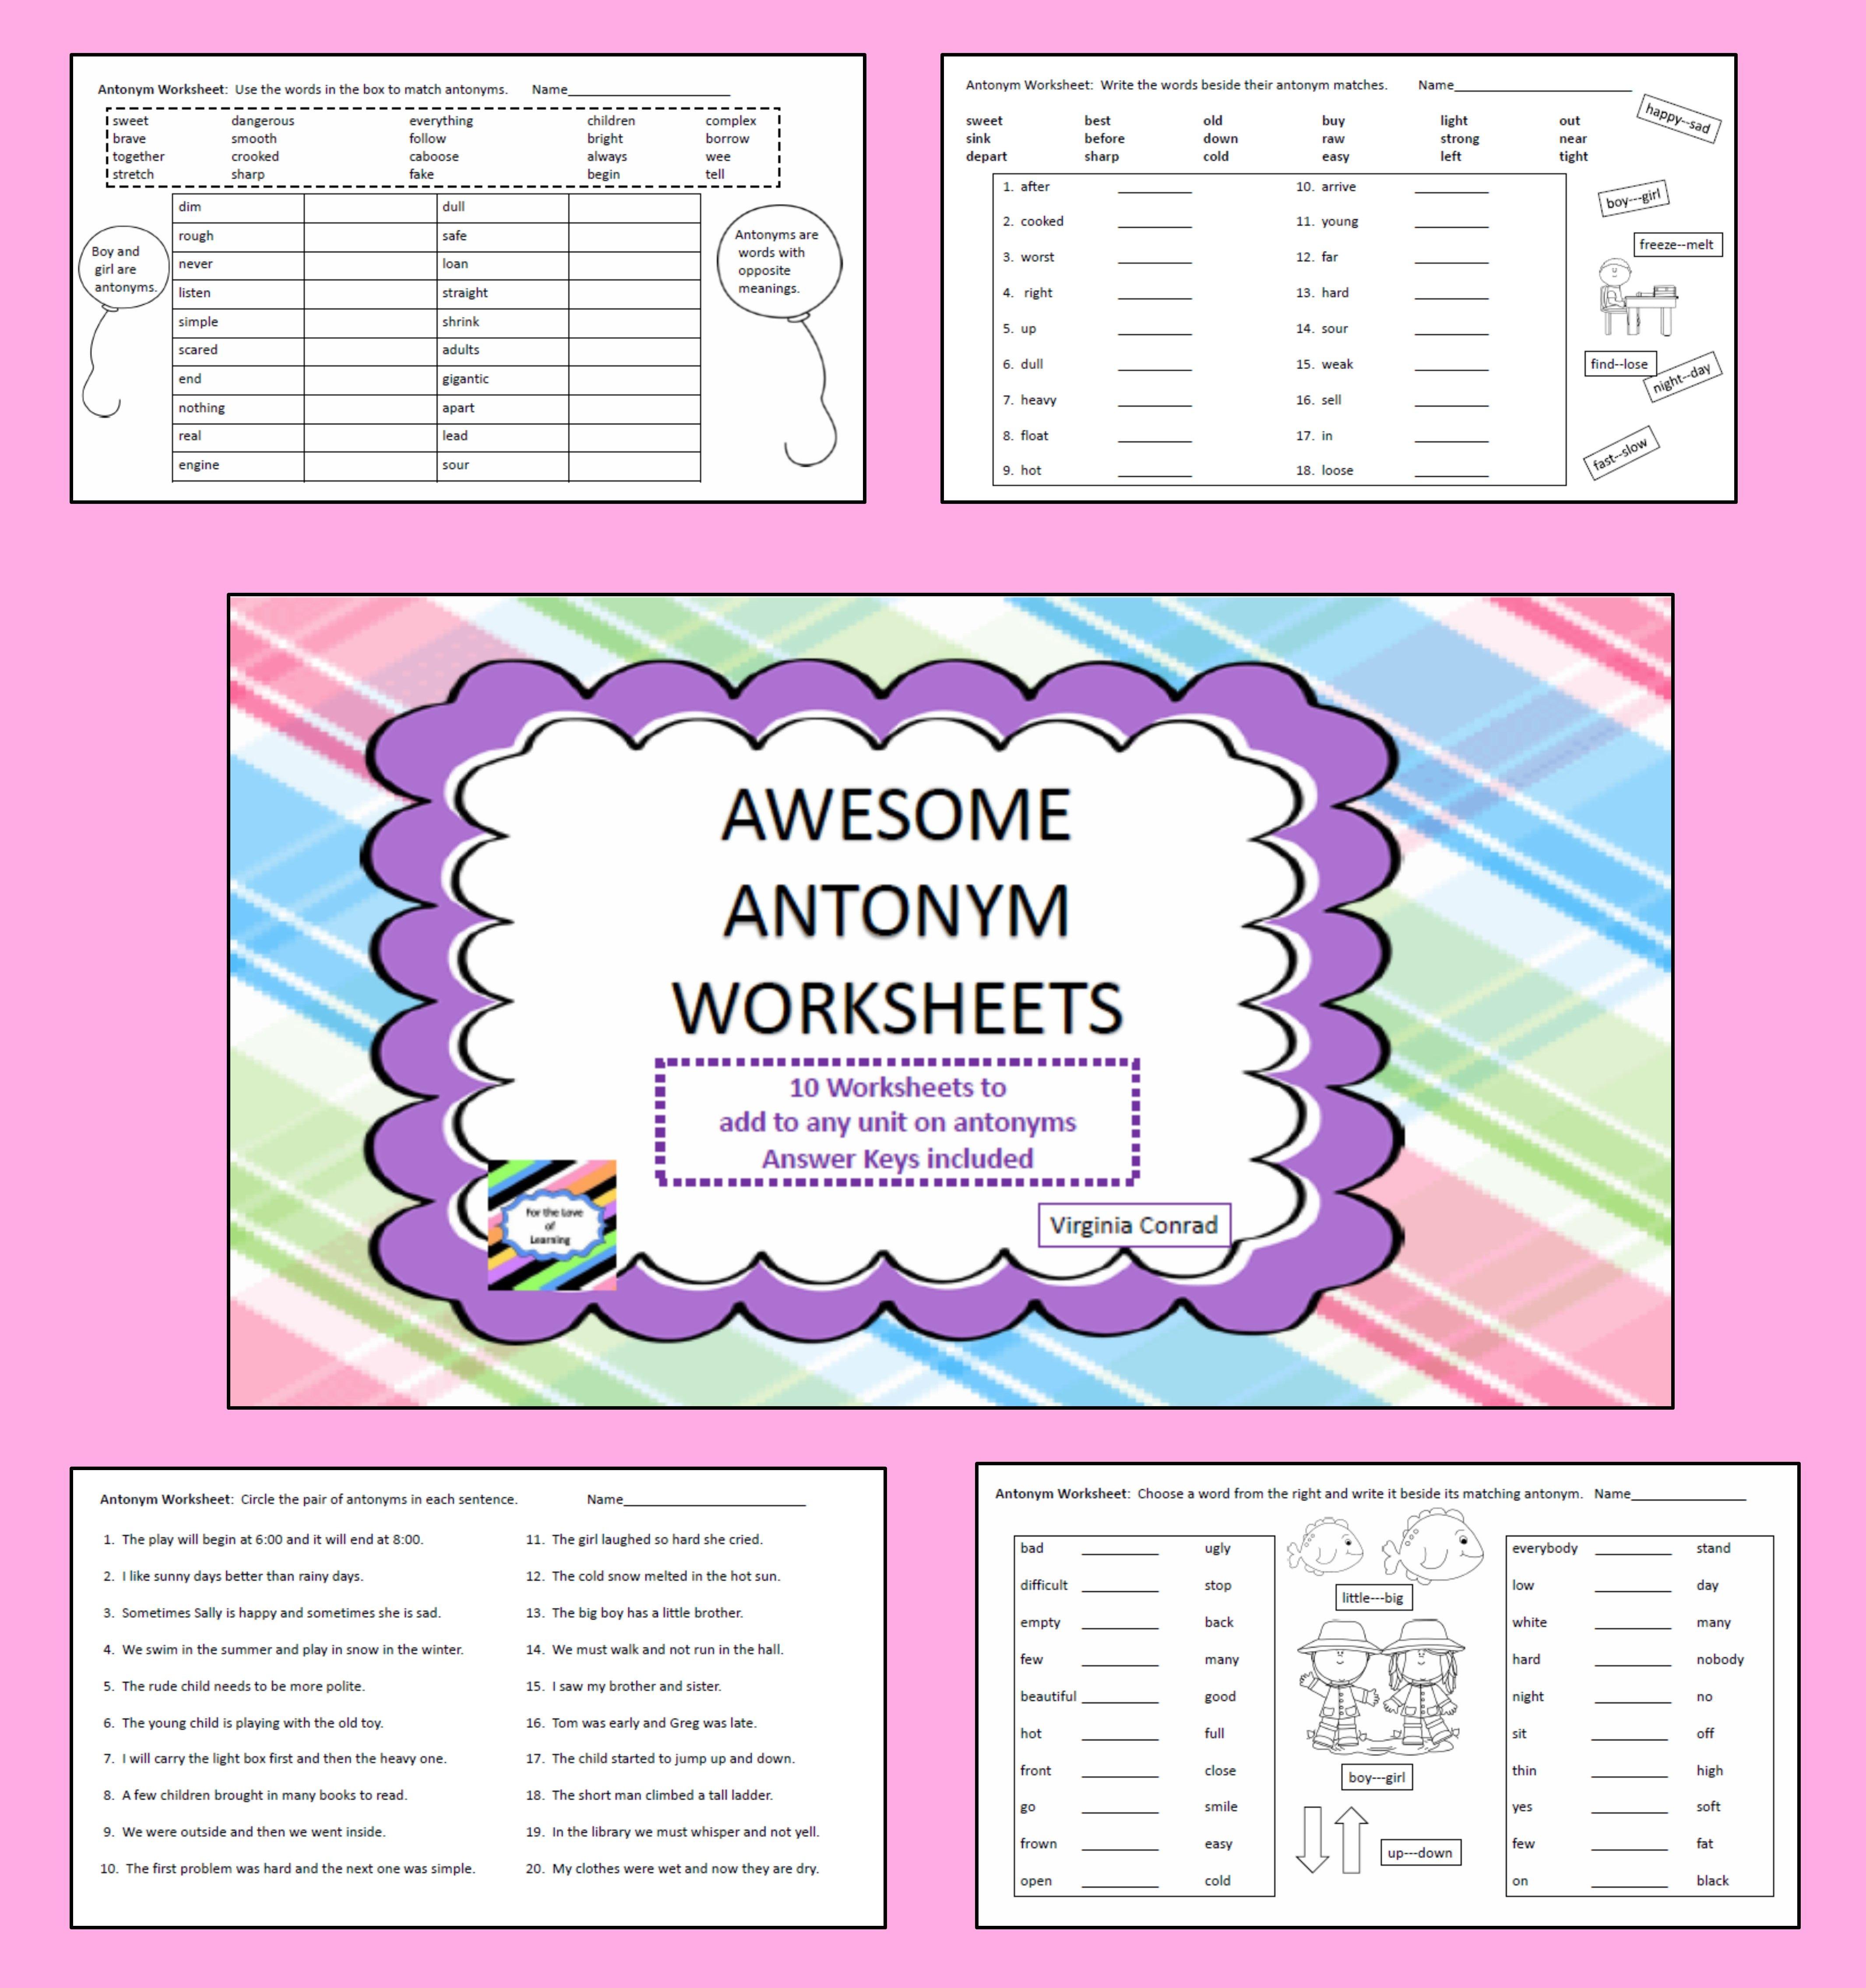 Antonym Worksheets